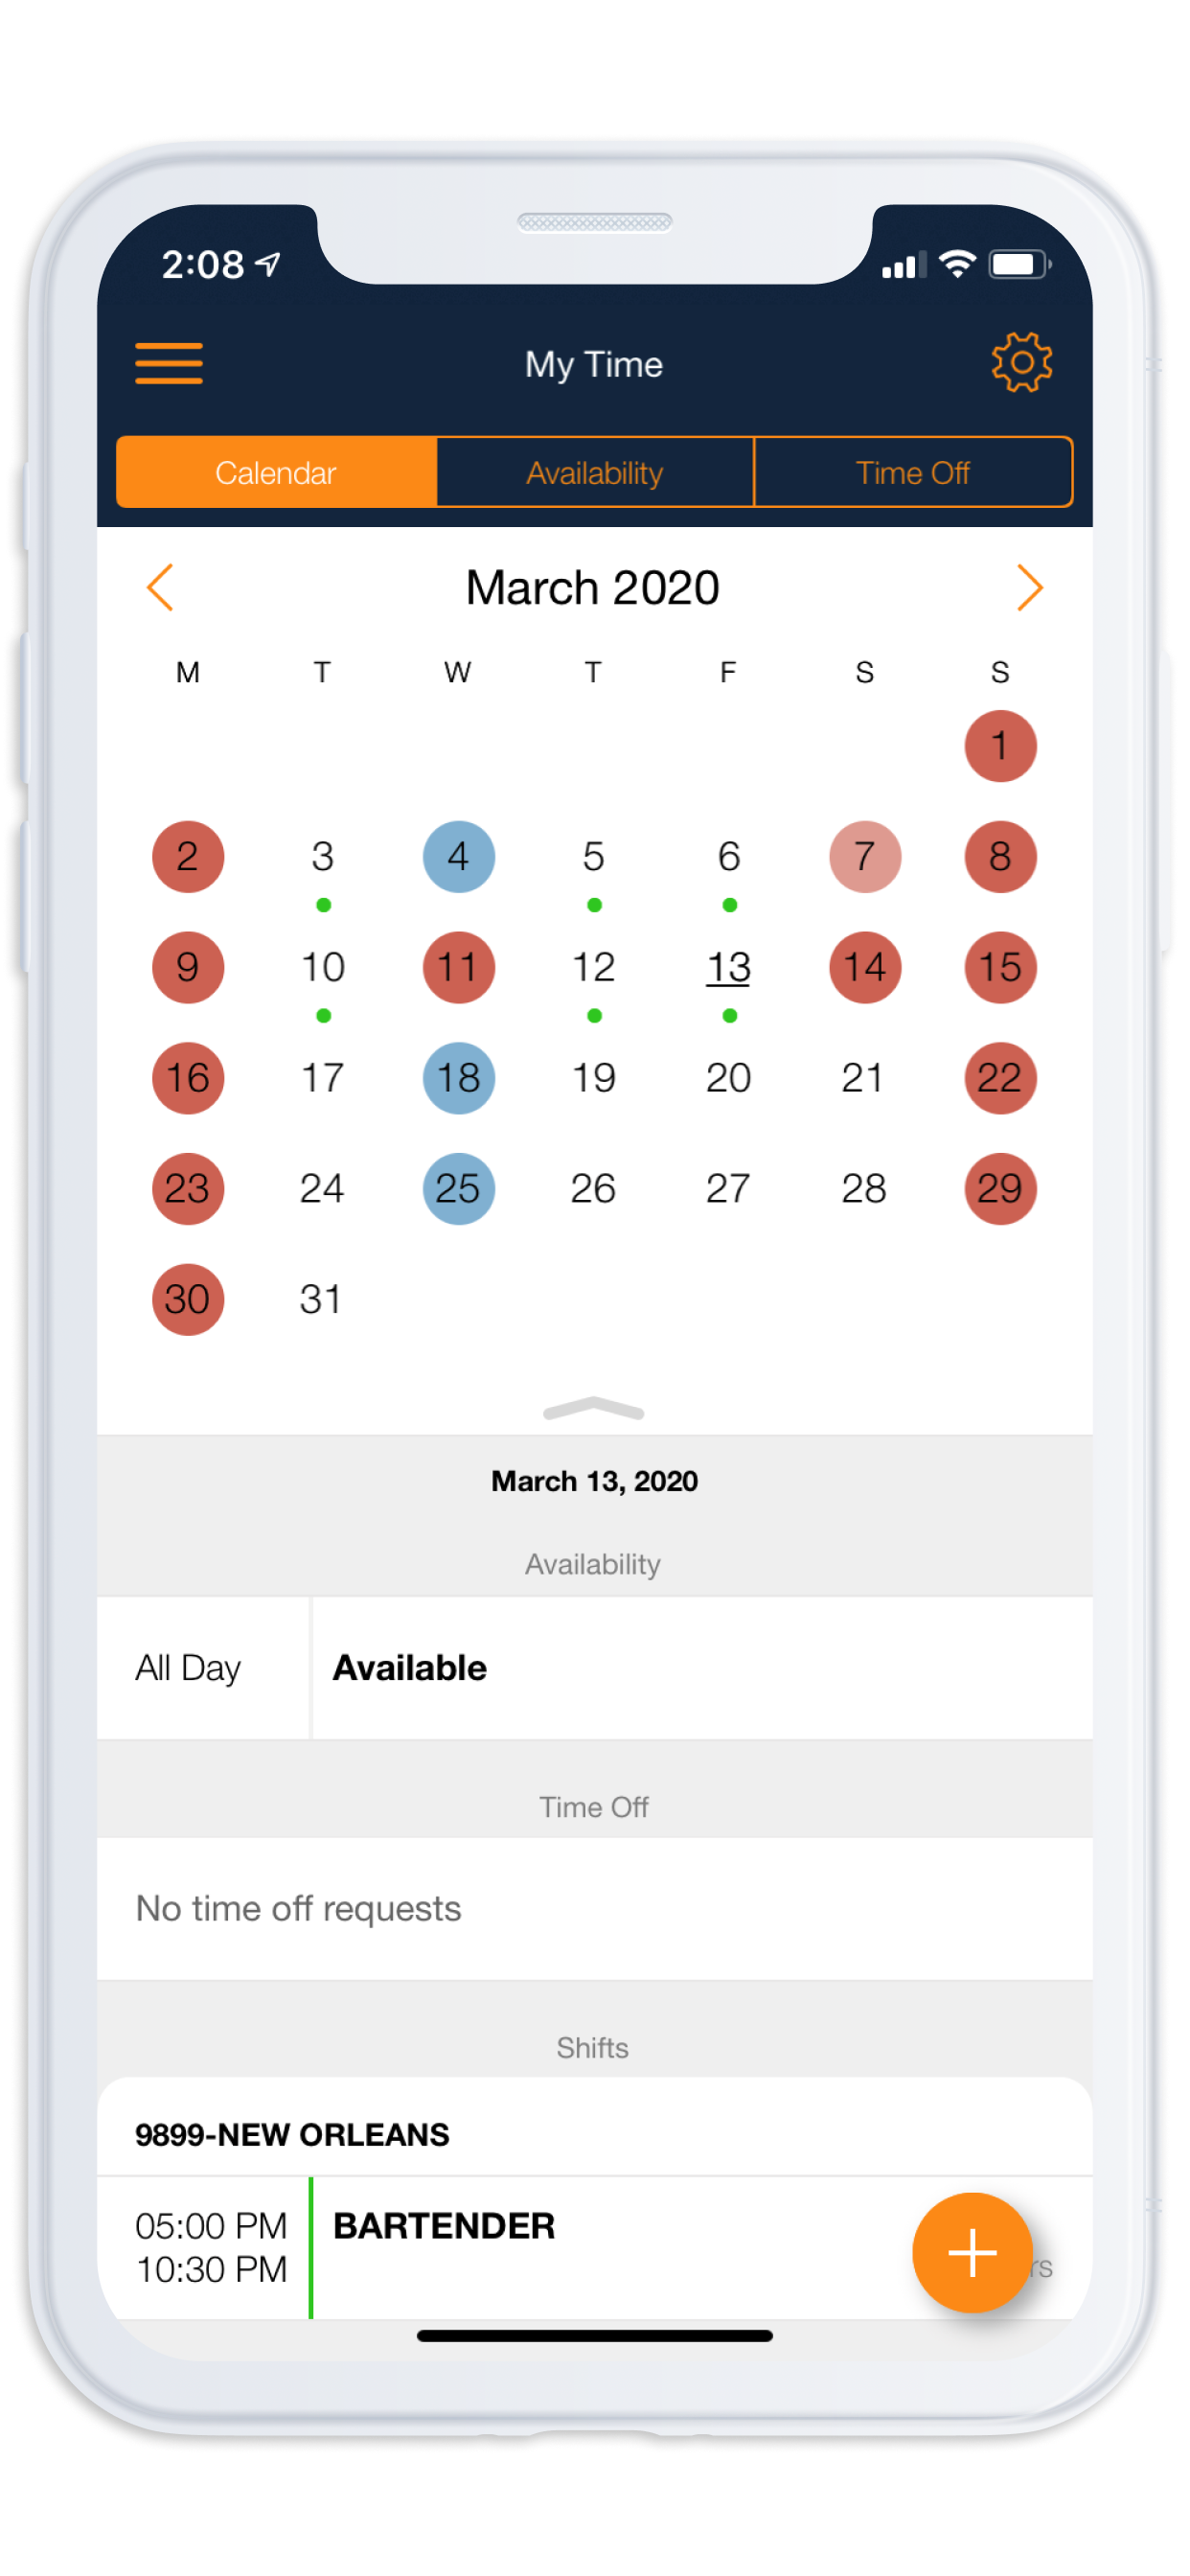 TeamworX 6.5 iPhone